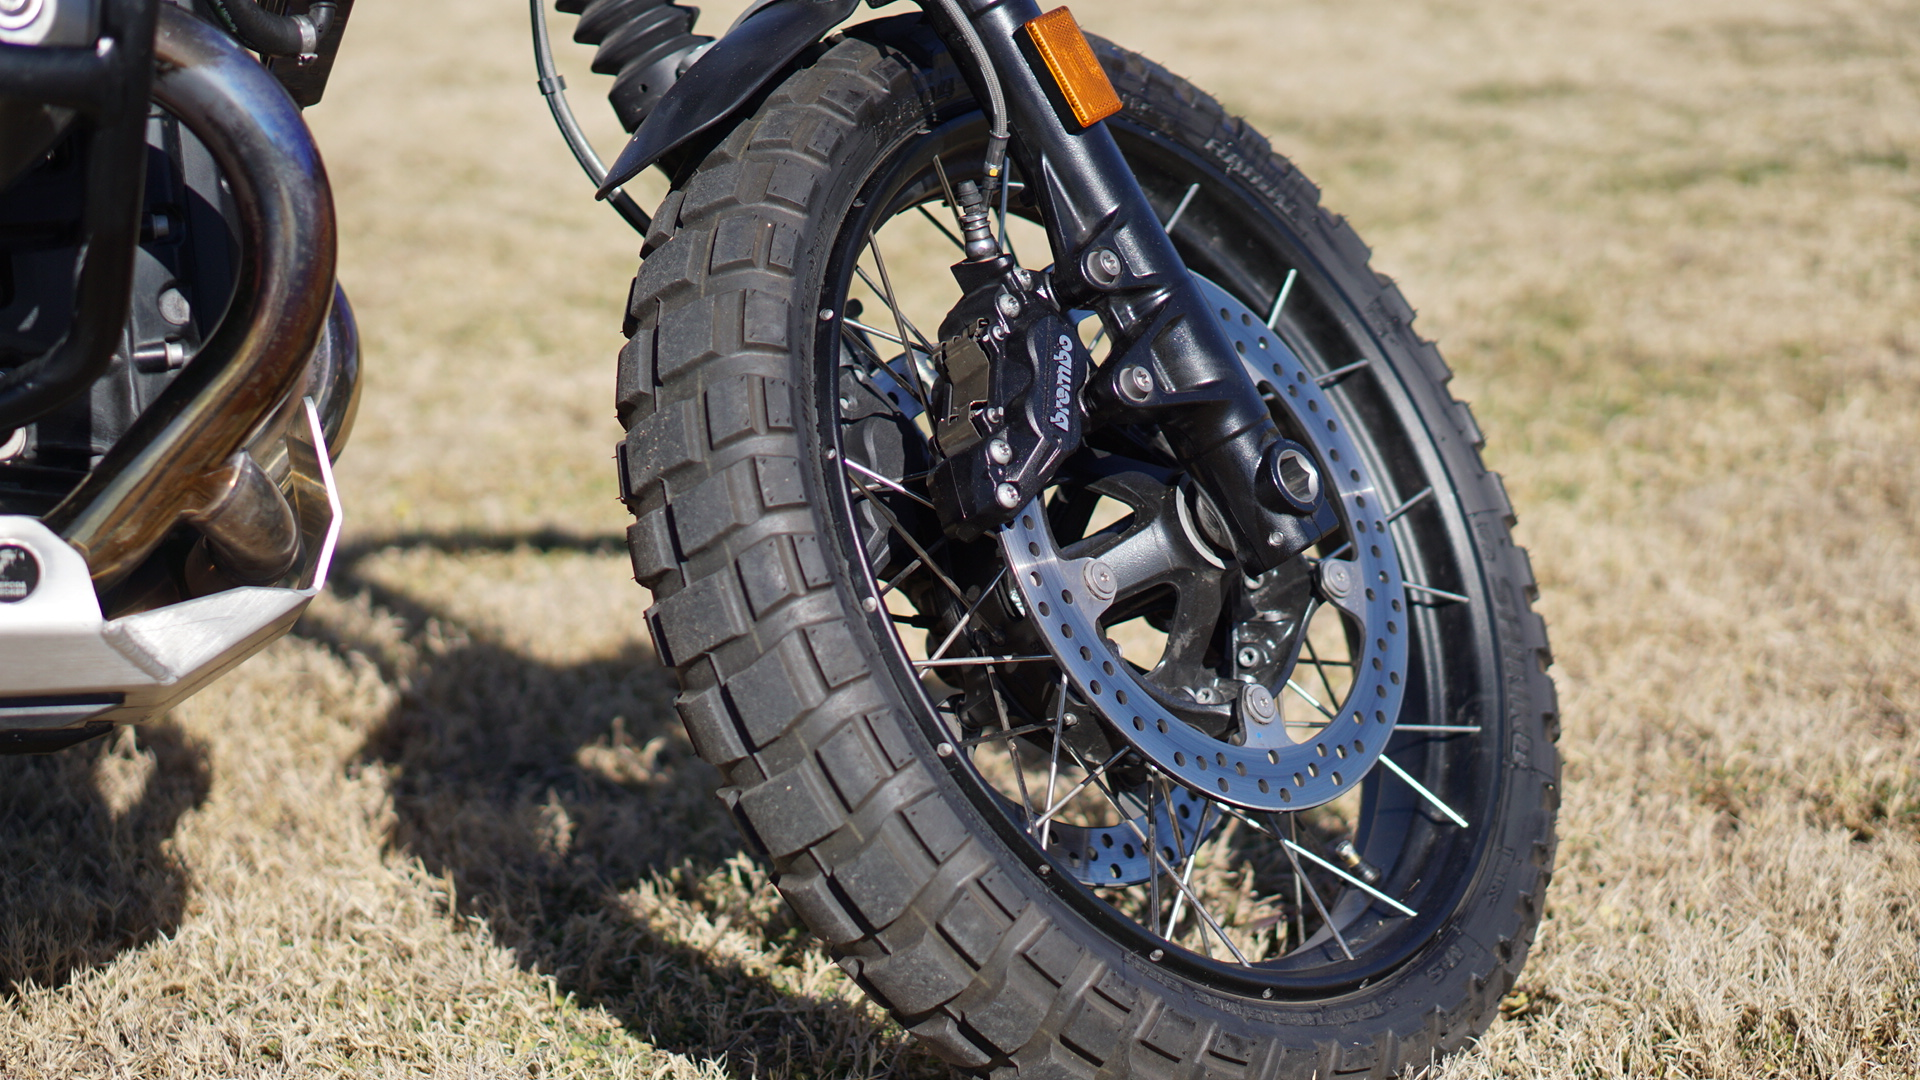 UGS ADV front tire.JPG